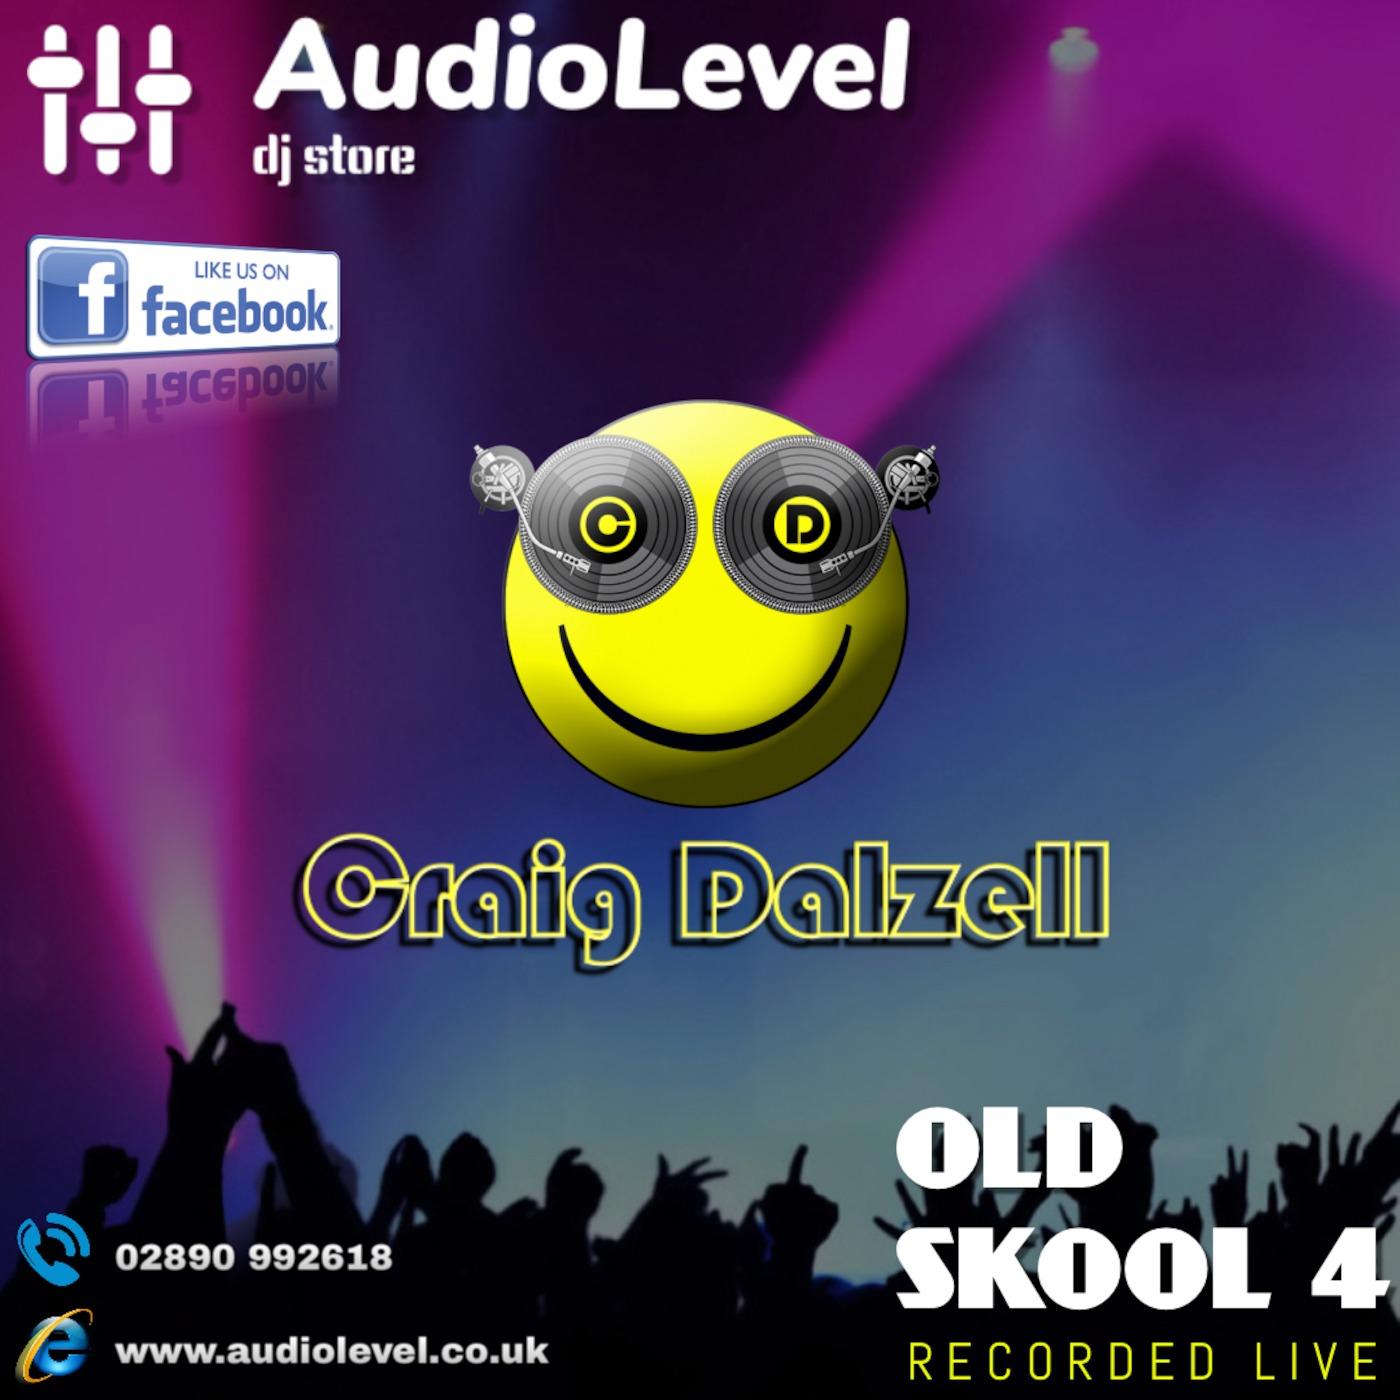 Old Skool 4 | Craig Dalzell Live @ AudioLevel (01/09/2019